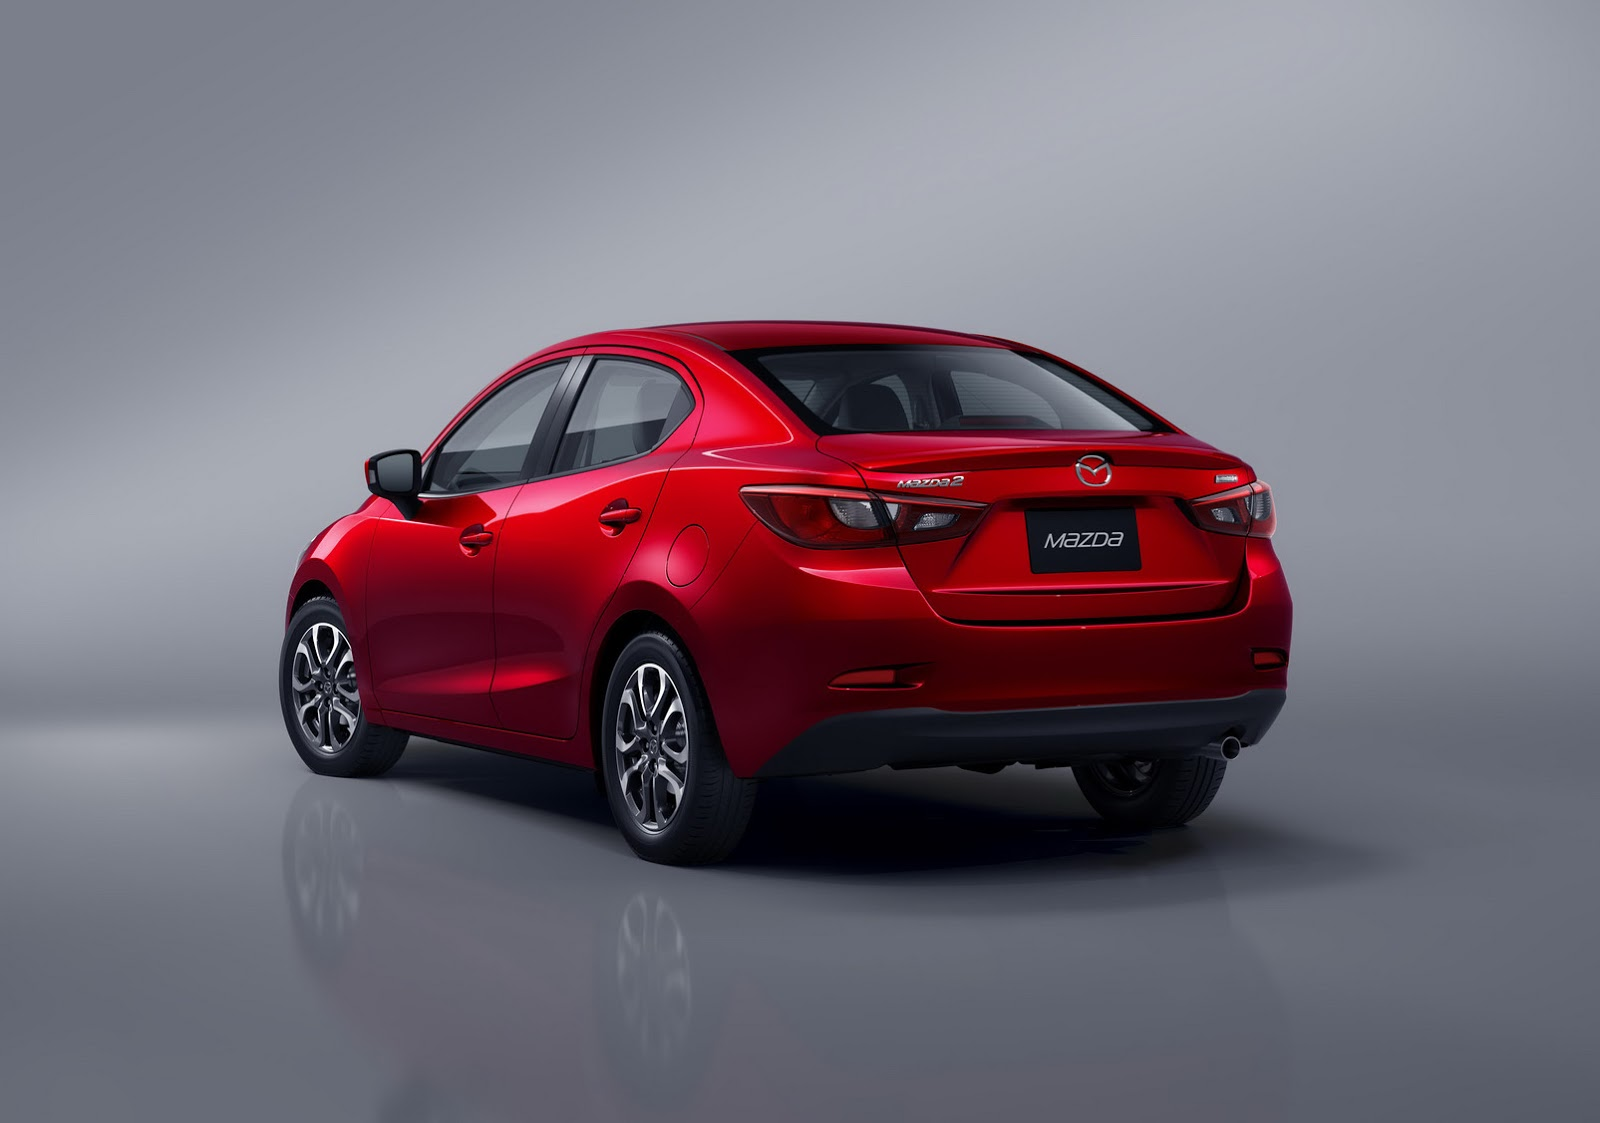 2016-Mazda2-Sedan-10.jpg